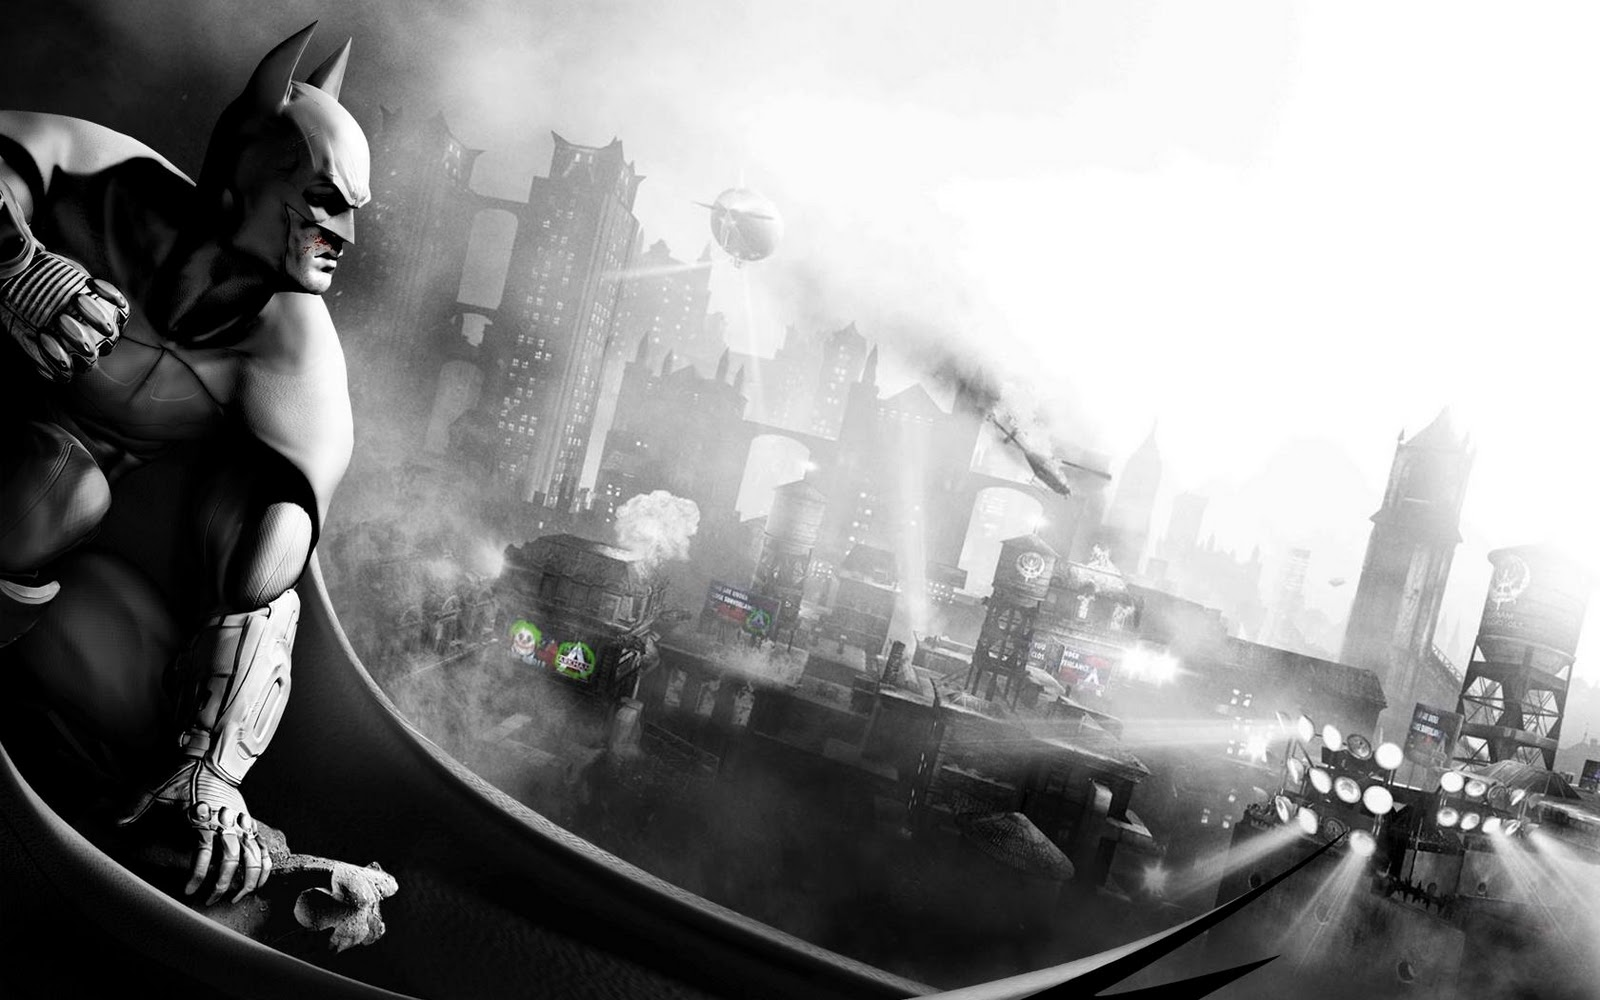 http://1.bp.blogspot.com/-bbvcvfX2rf8/Tq3NpoW4TEI/AAAAAAAAD_U/J5_ZJgqROho/s1600/Batman-Arkham-City-Wallpapers-HD-Griffinskato-4.jpg